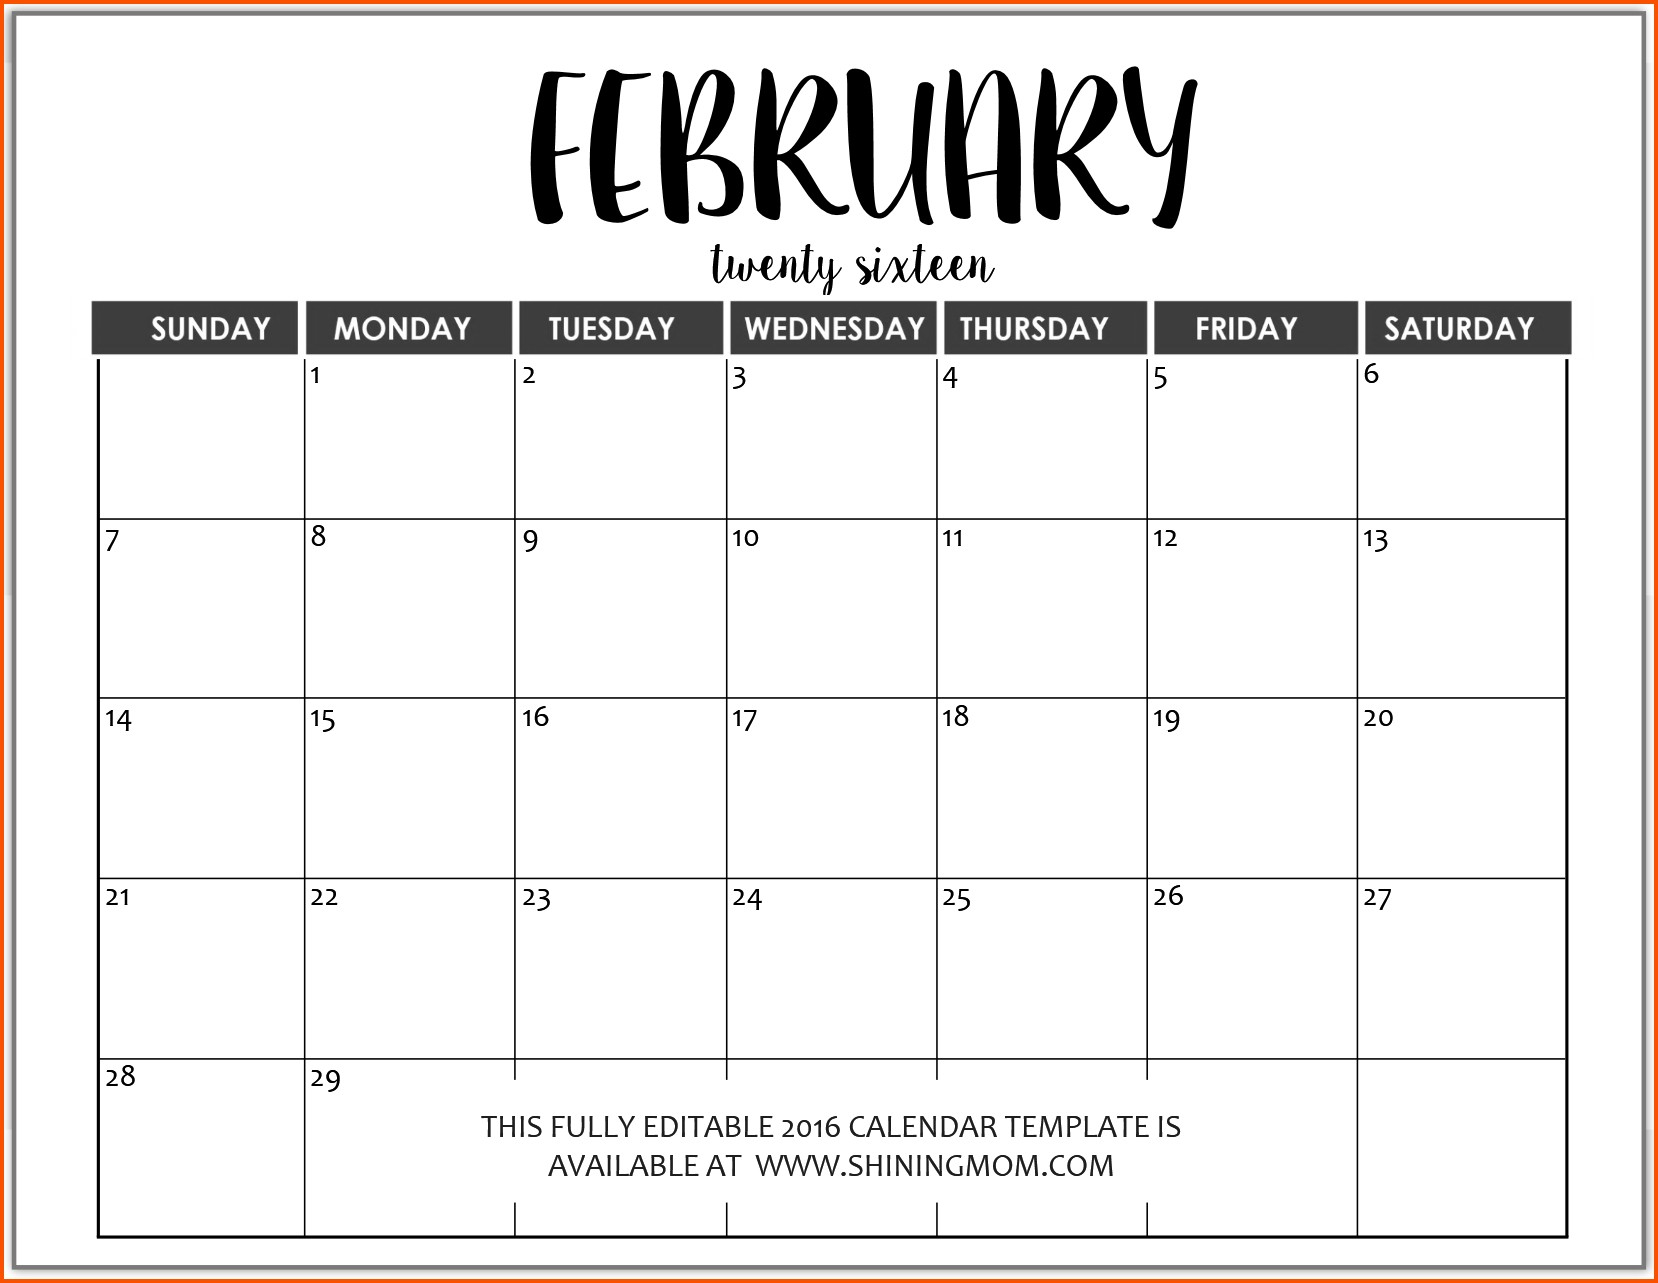 008 Calendar Templates Word Weekly Template June Free